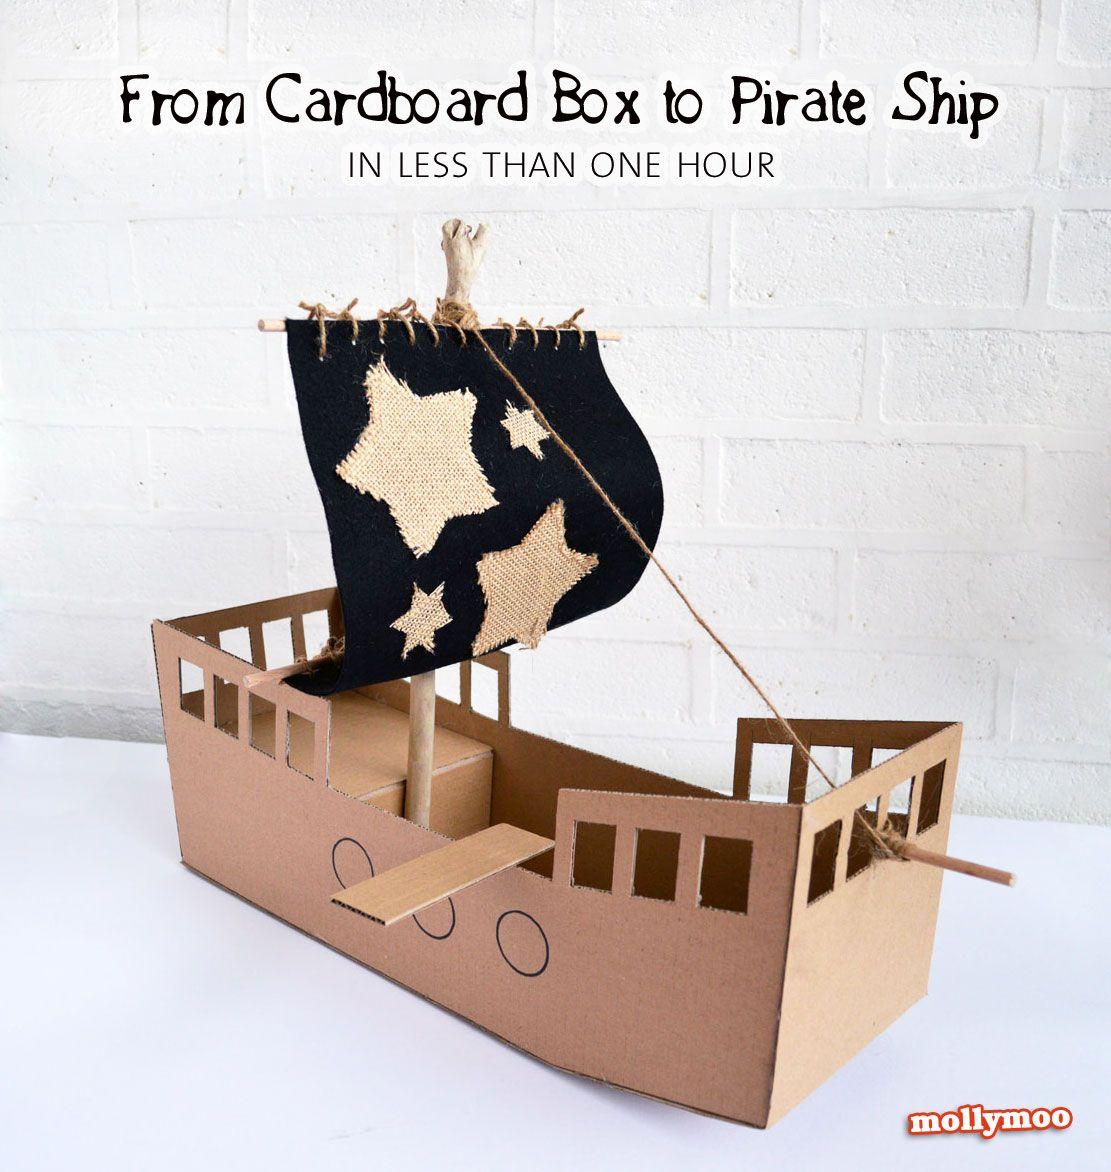 DIY Cardboard Pirate Ship - craft tutorial | Barco pirata, Carton ...